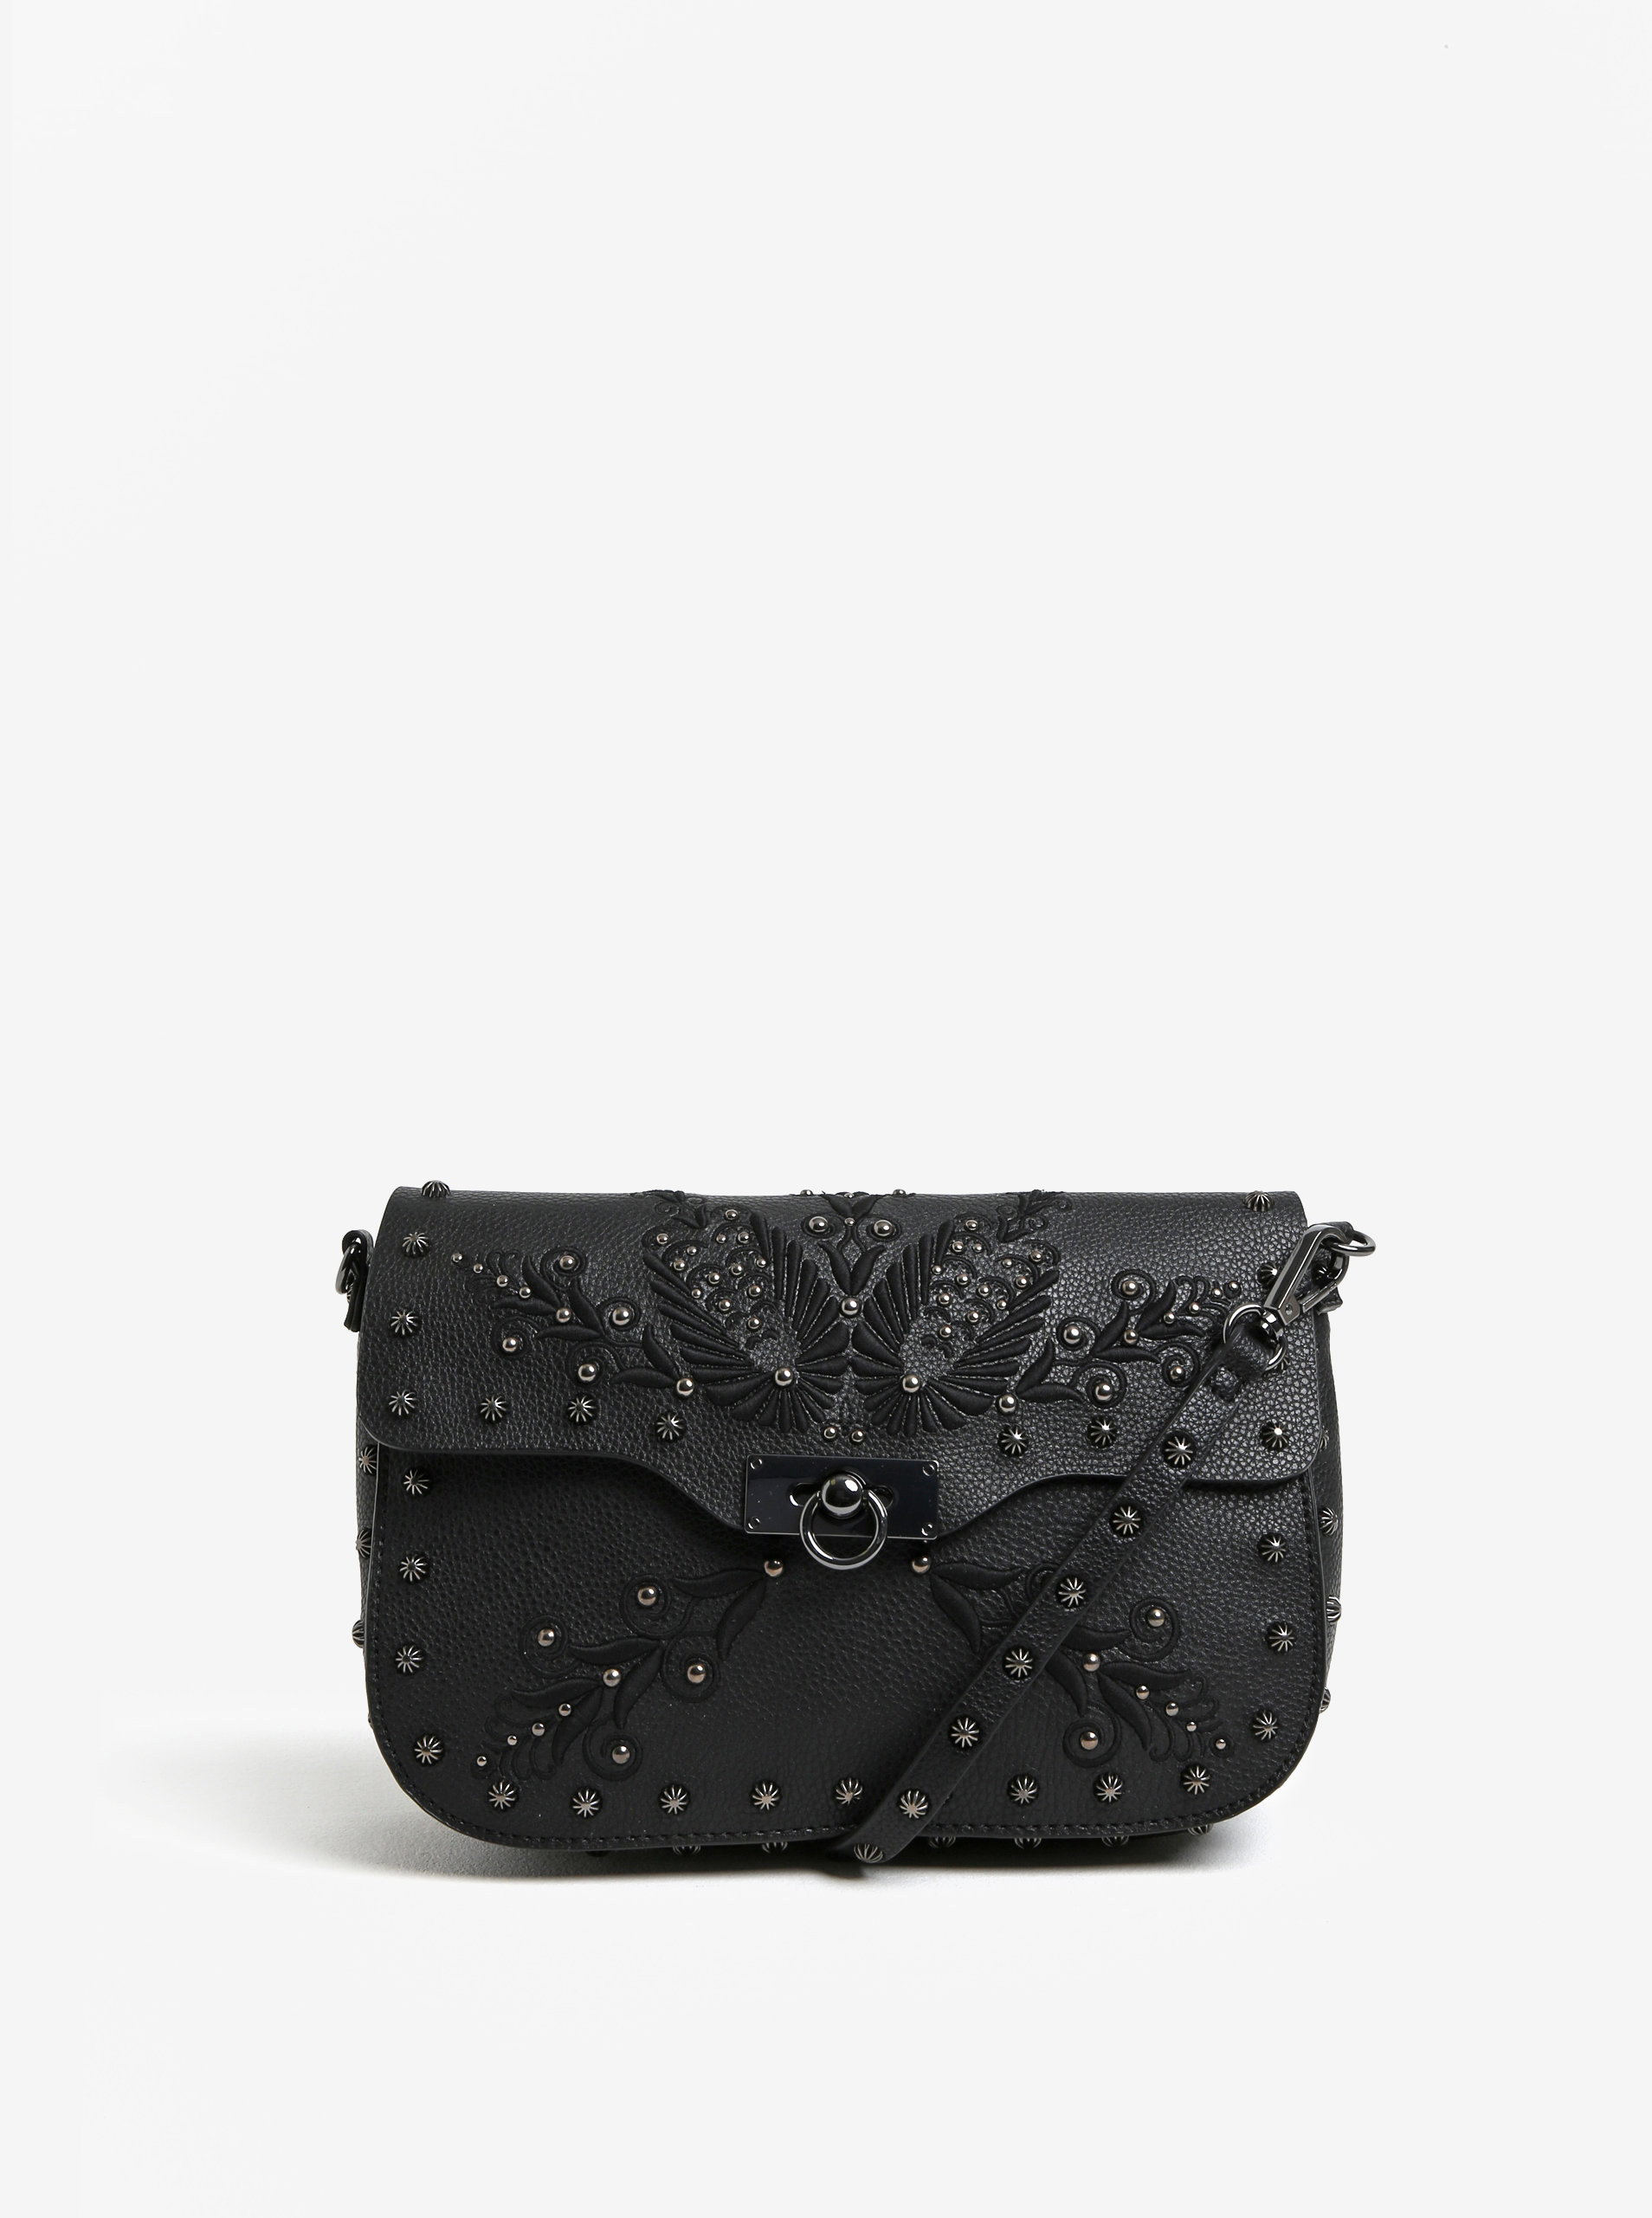 Černá crossbody kabelka s ozdobami Desigual Amorgos ... 3e1b80c0b8d